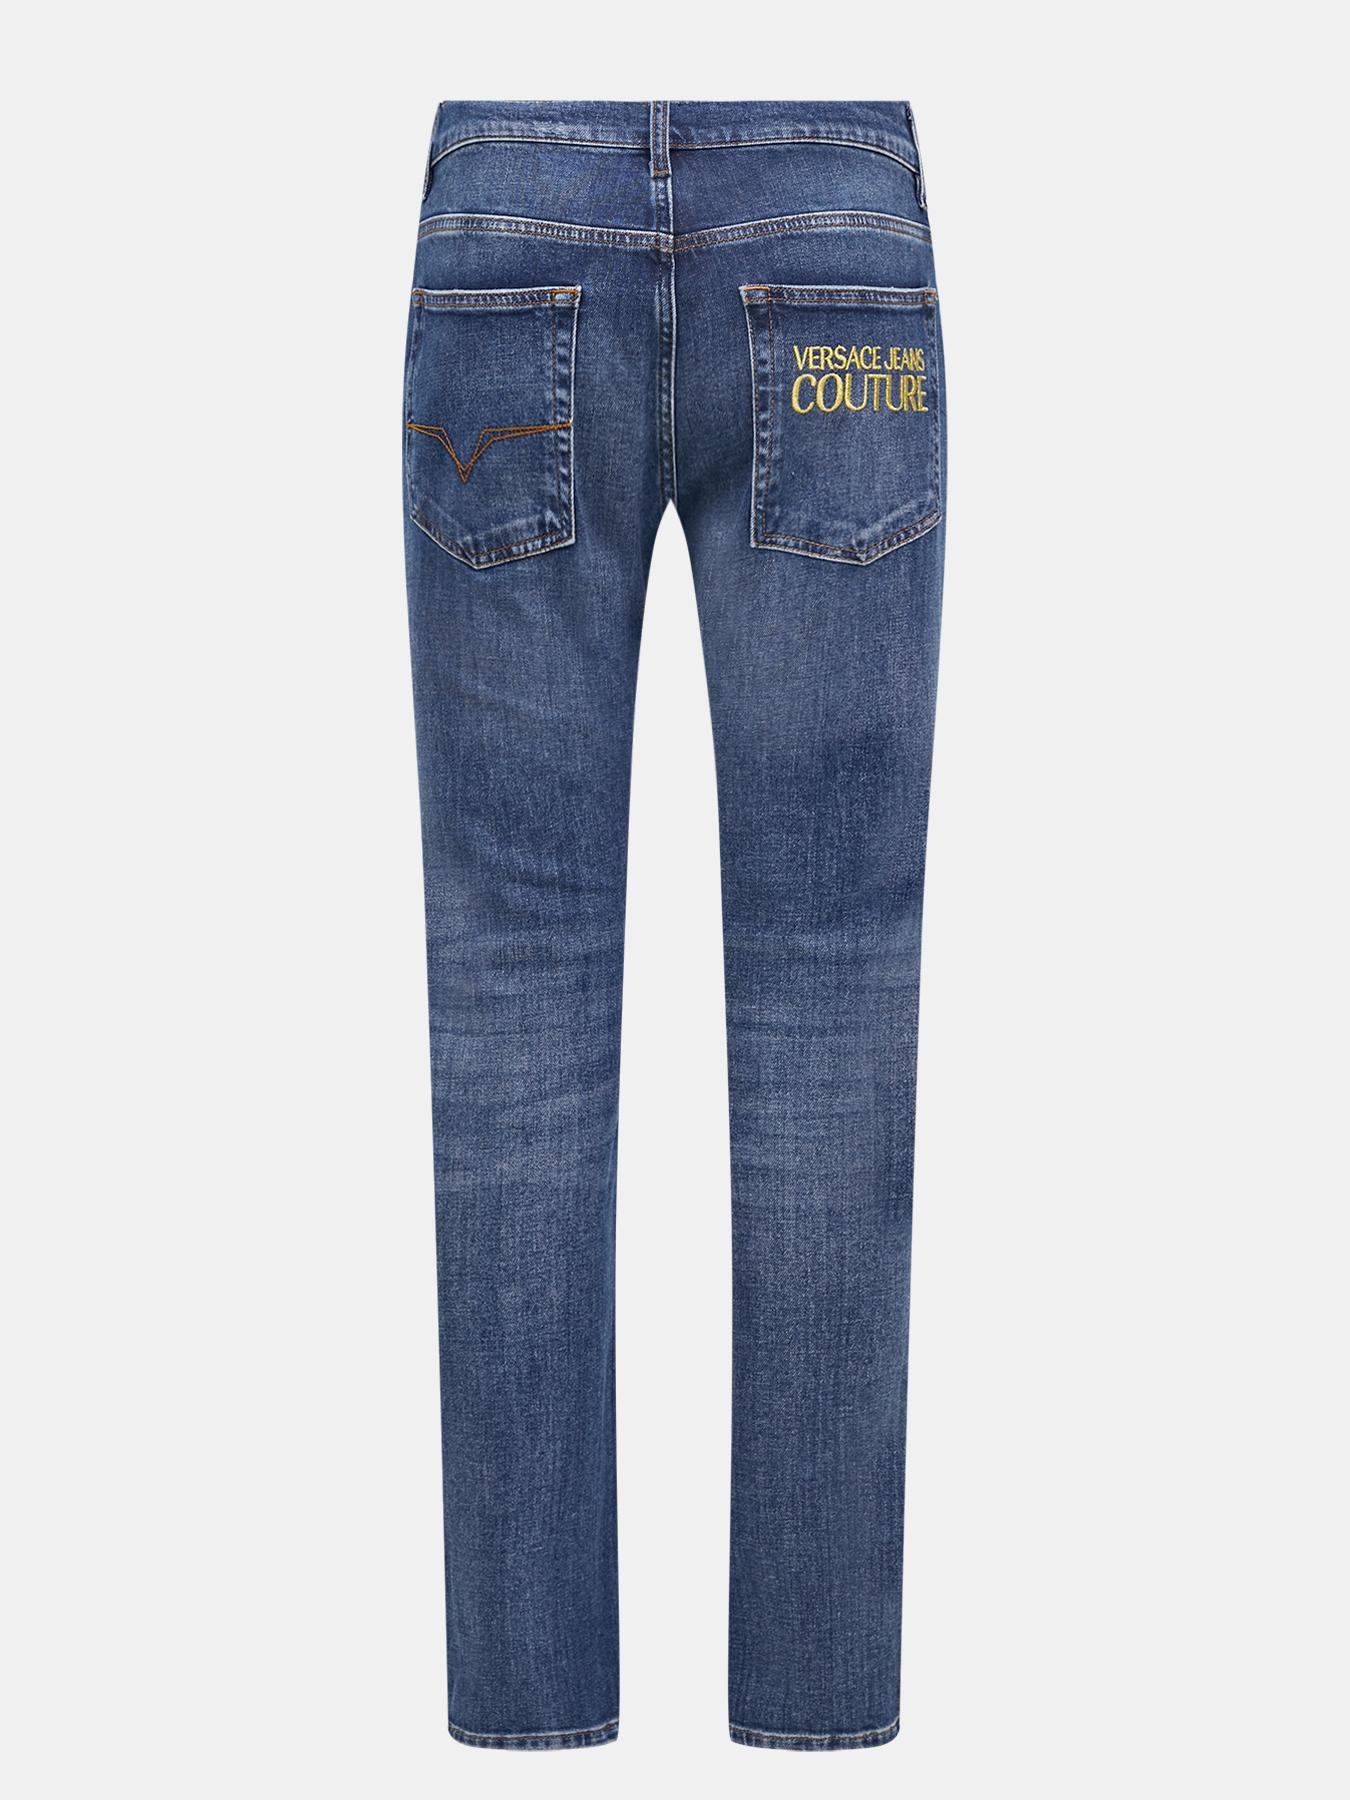 Брюки Versace Jeans Couture Джинсы